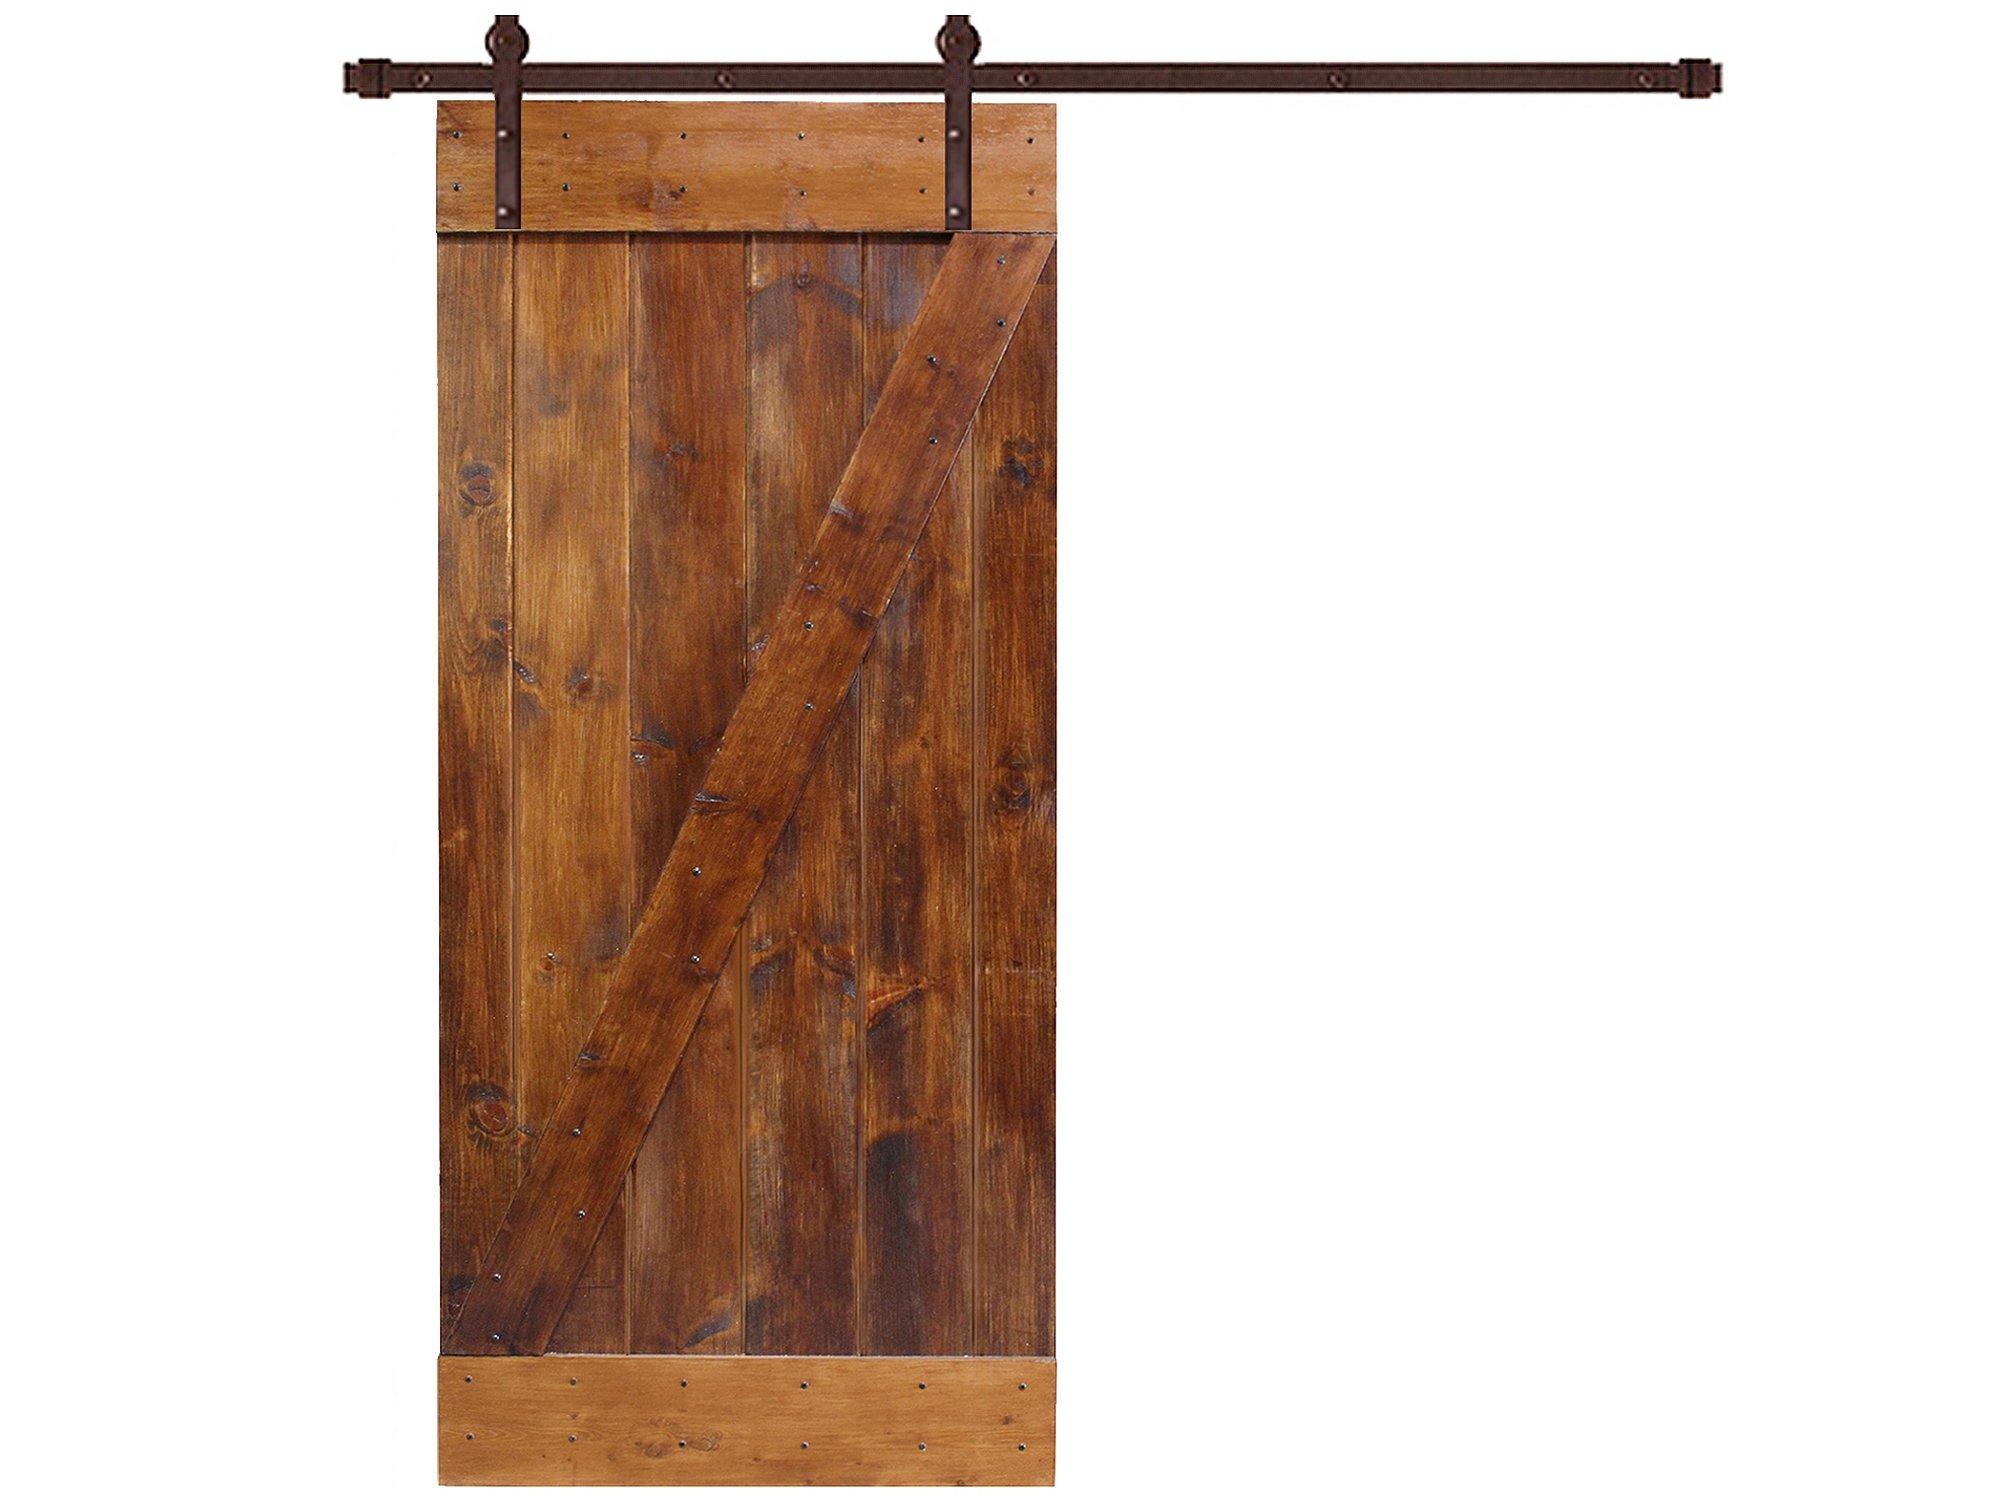 TMS 6.6 FT Sliding Hardware Set+ Solid Interior Barn Knotty Wood Painted Door Slab